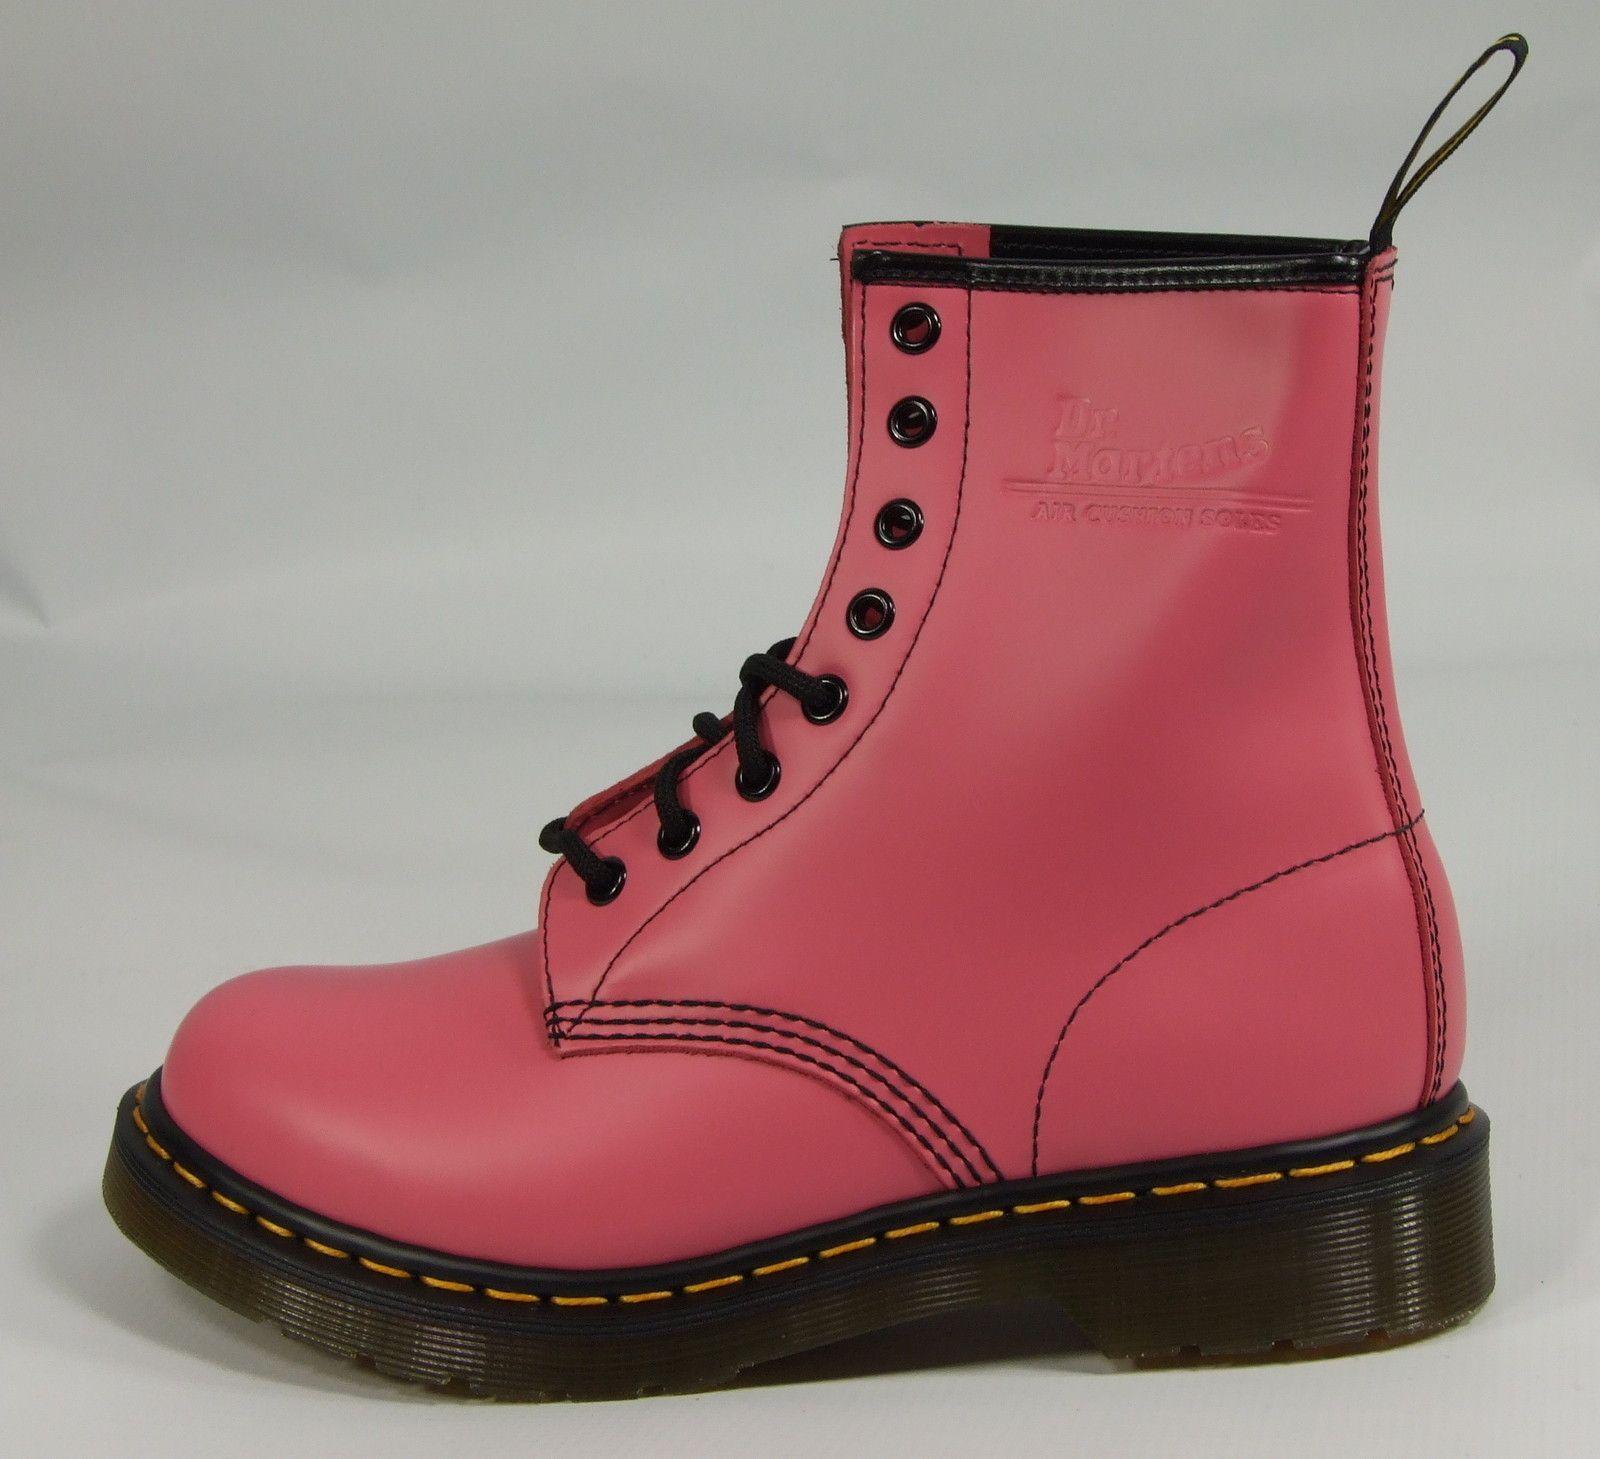 Dr. Martens Hot Pink AirWair sandals